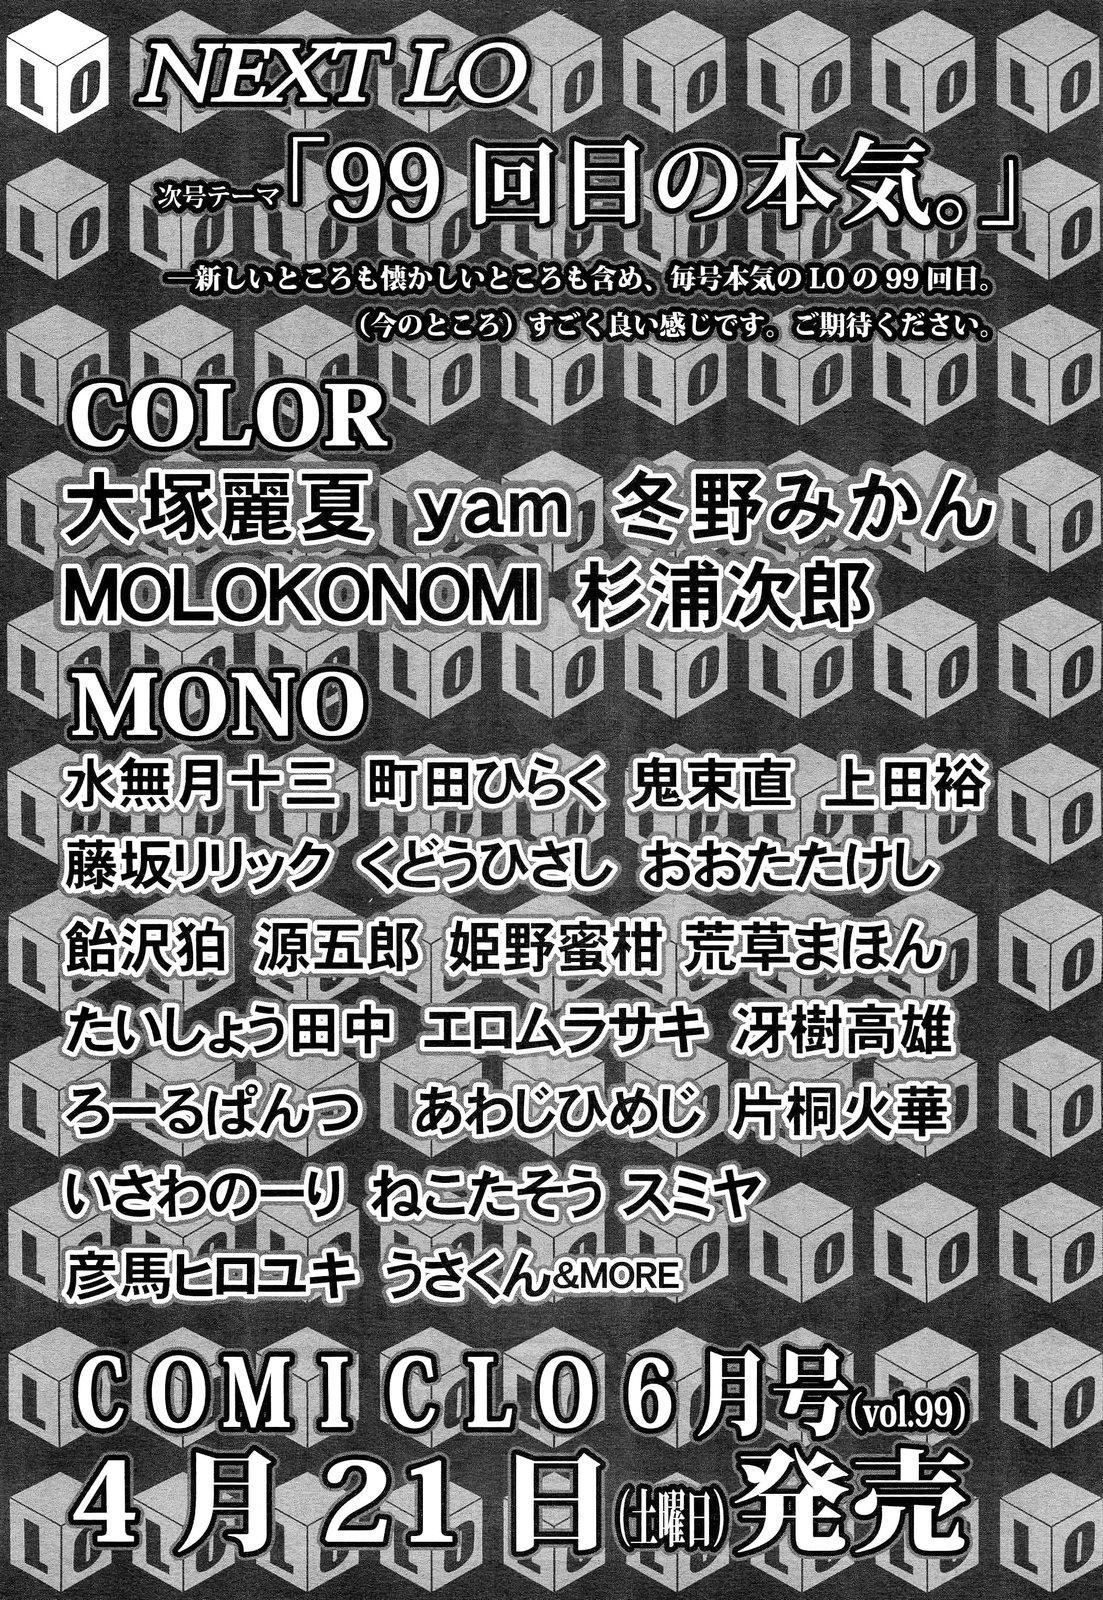 COMIC LO 2012-05 Vol. 98 442